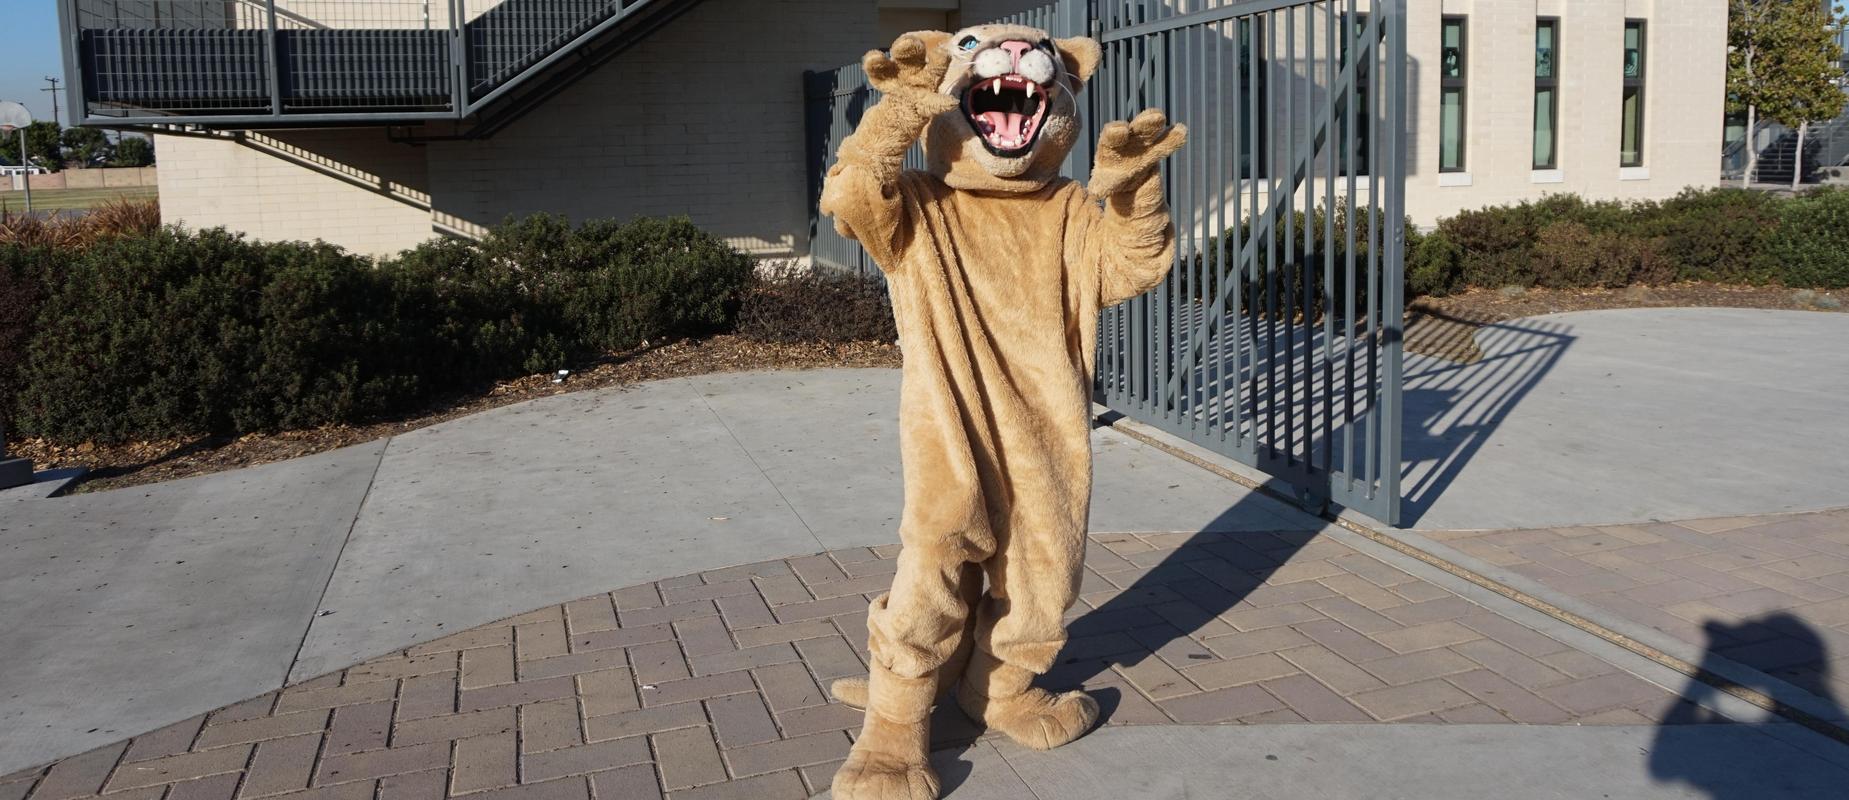 cougar mascot picture